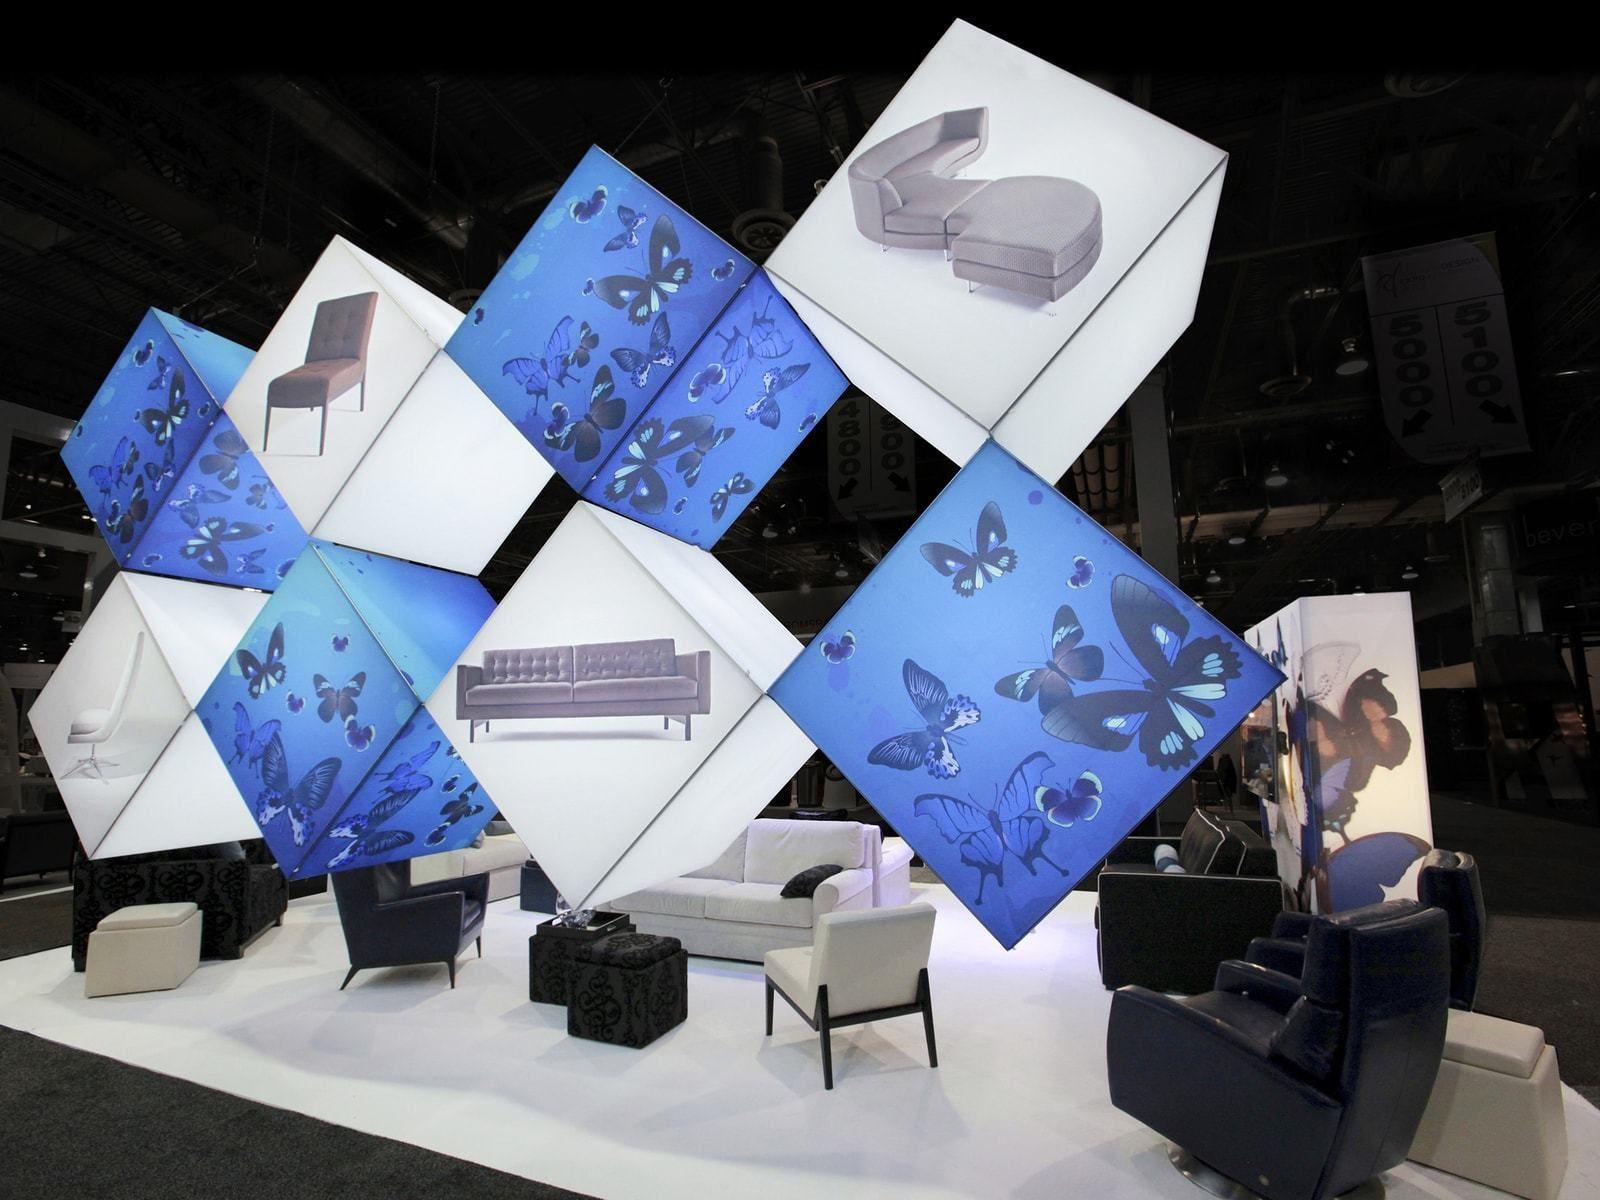 exhibit design ideas inspiration trade show displays